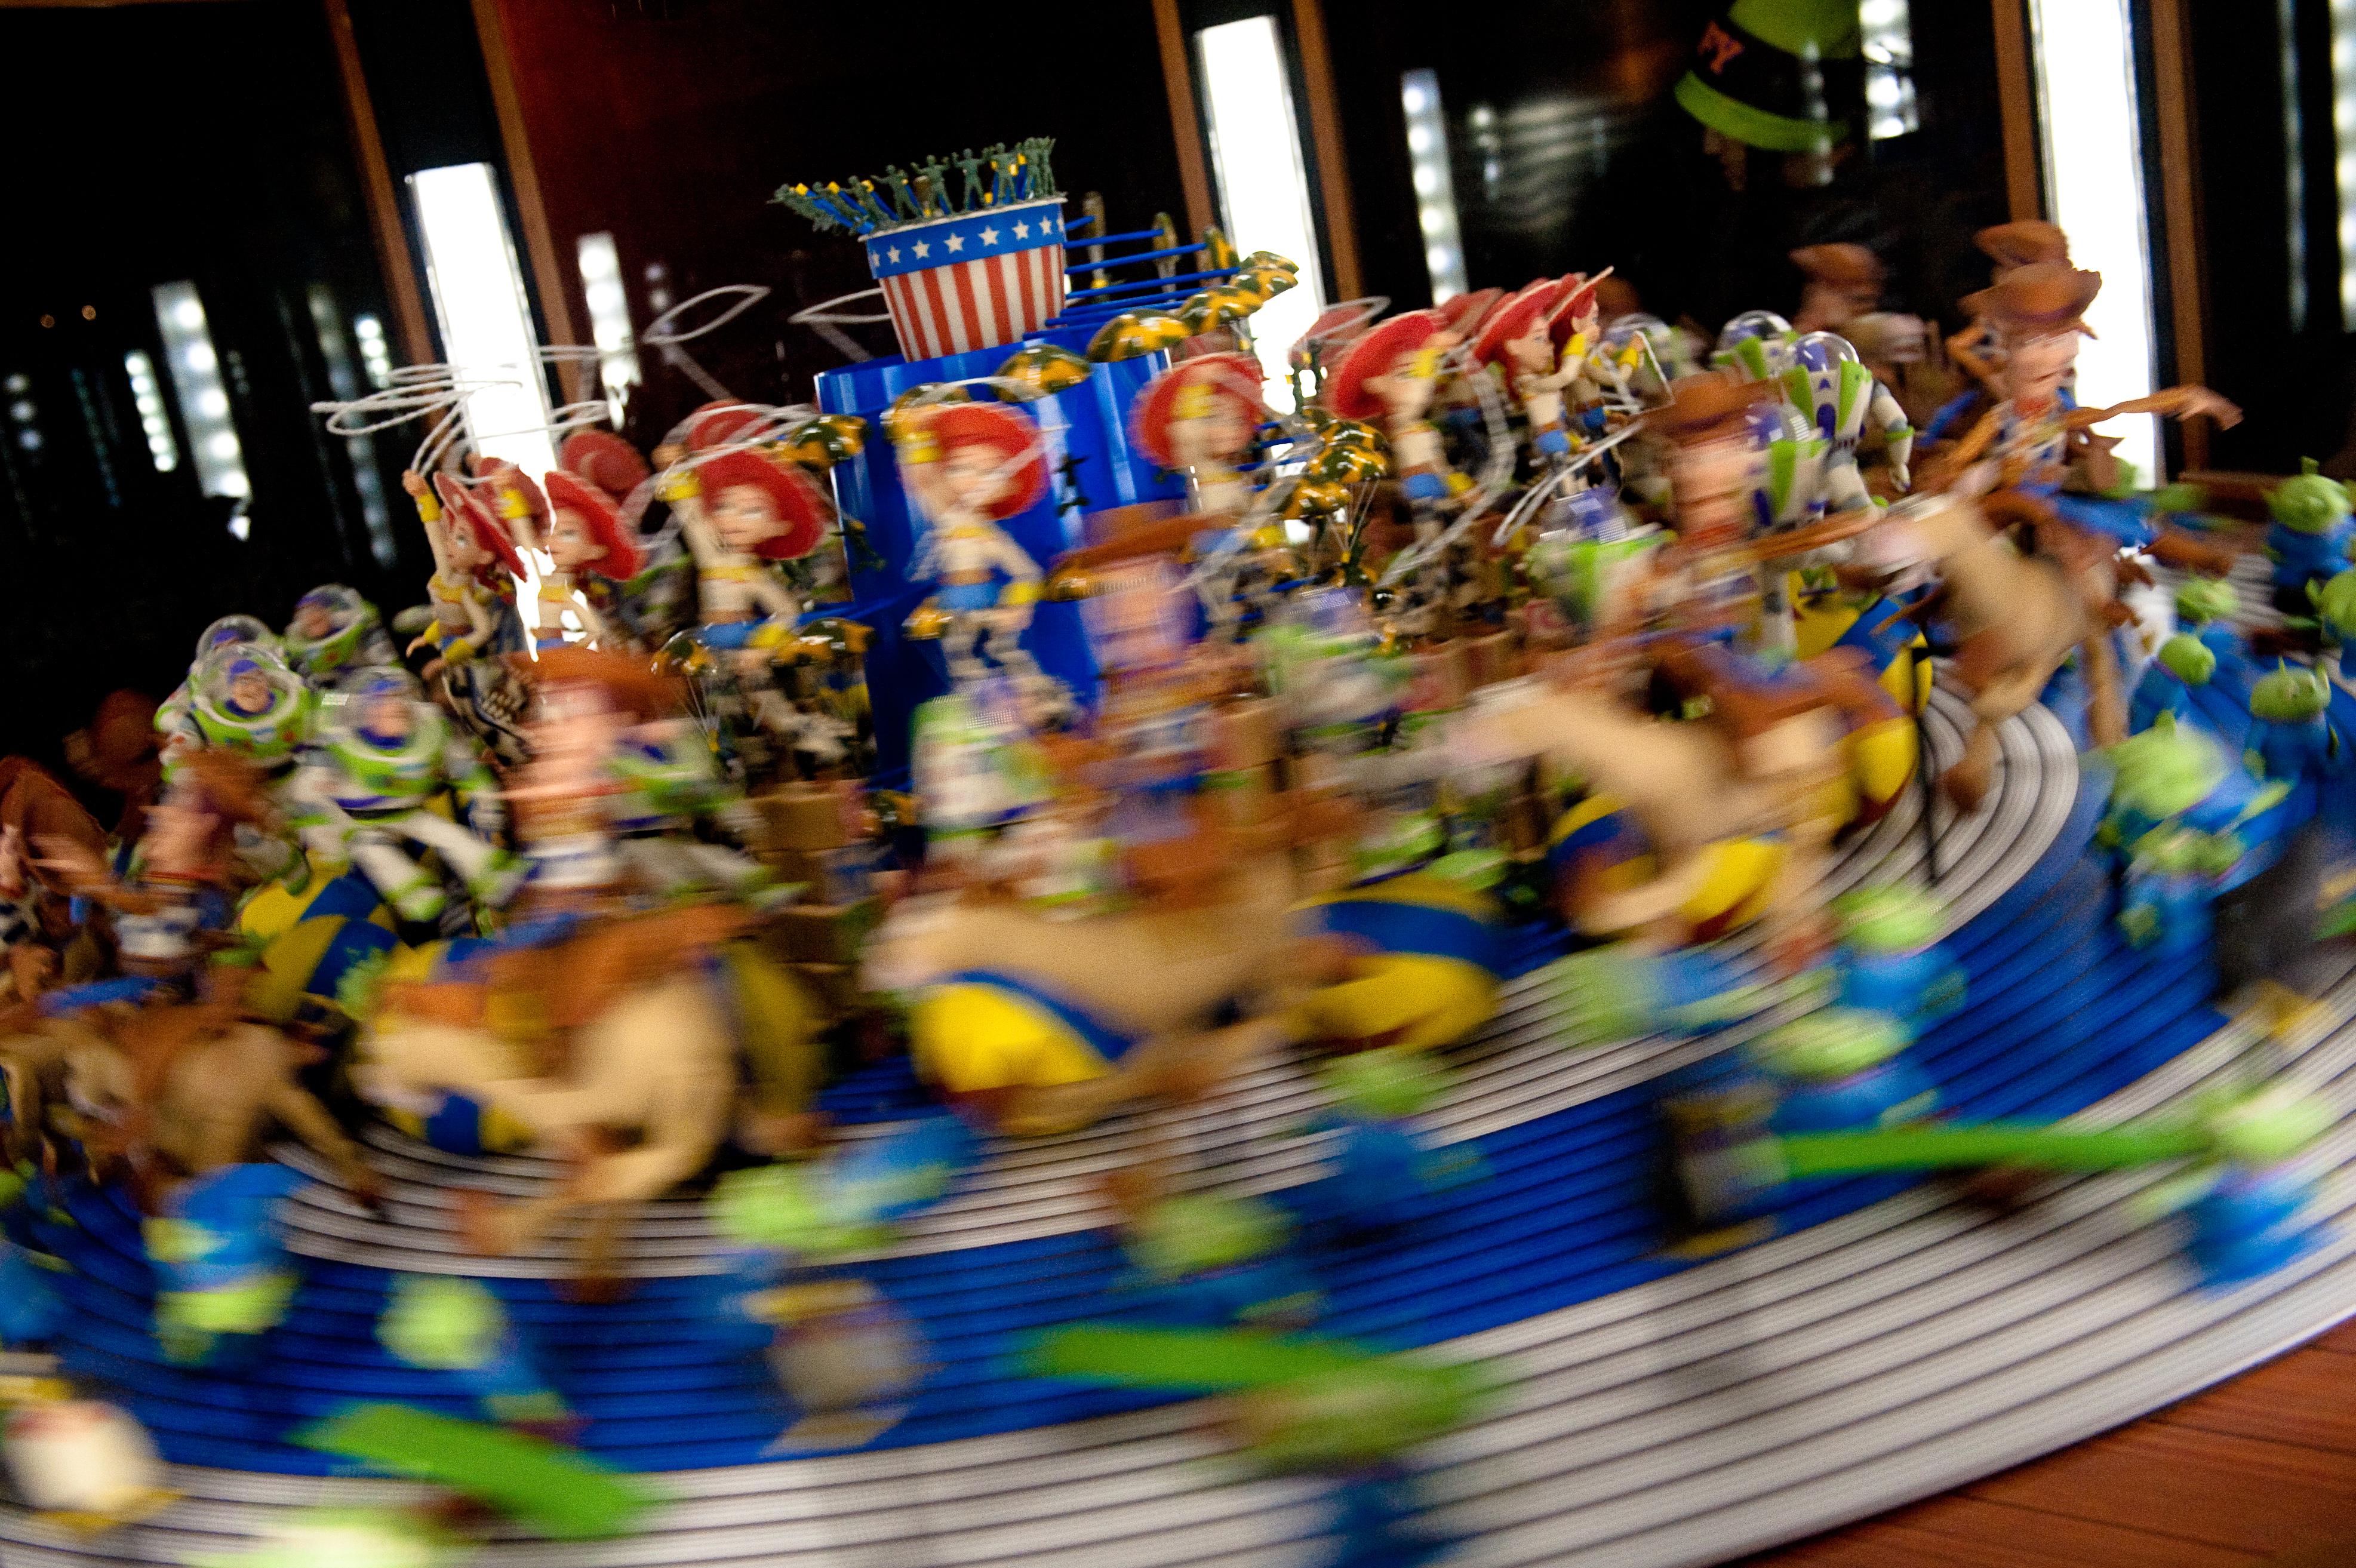 Toy_Story_Zoetrope,_Disney_California_Adventure_2